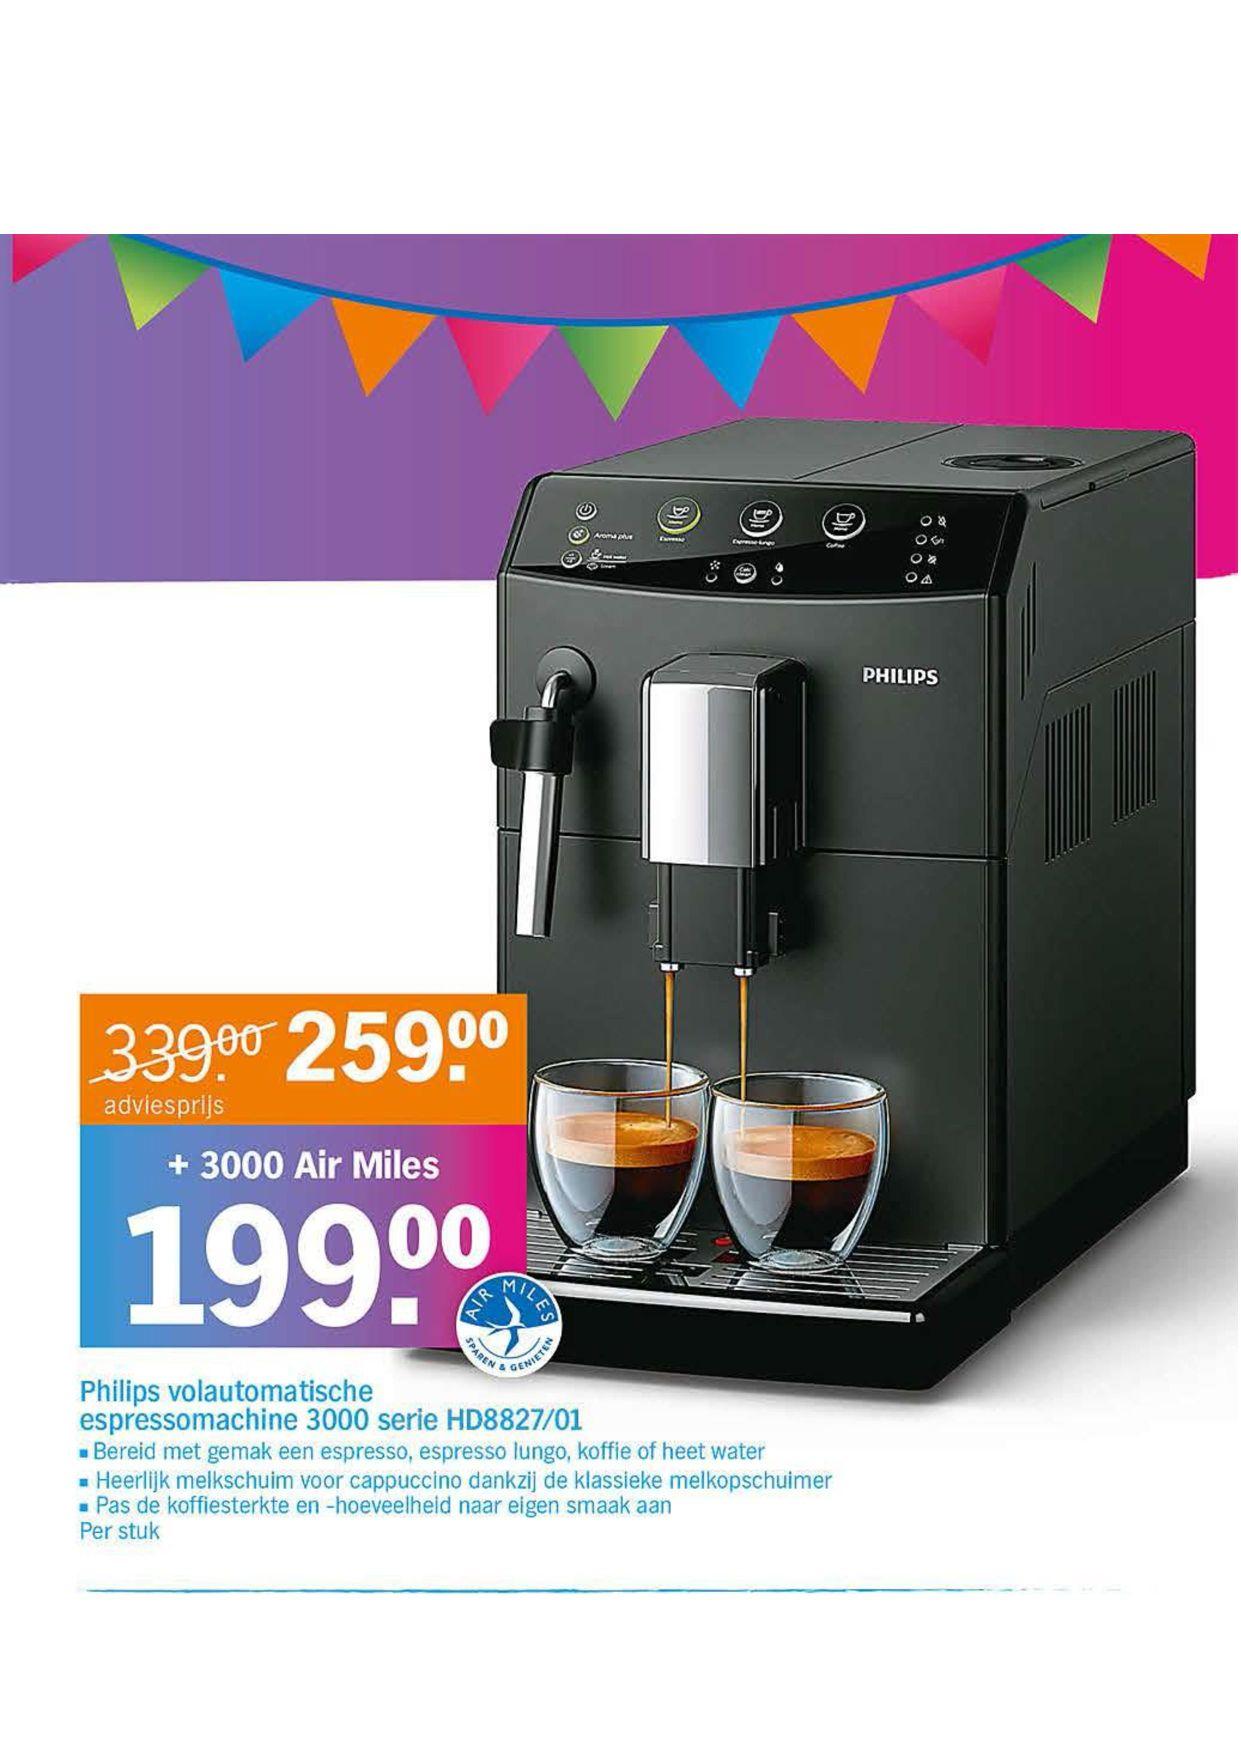 [Airmiles] Philips volautomatische espressomachine 3000 serie HD8827/01